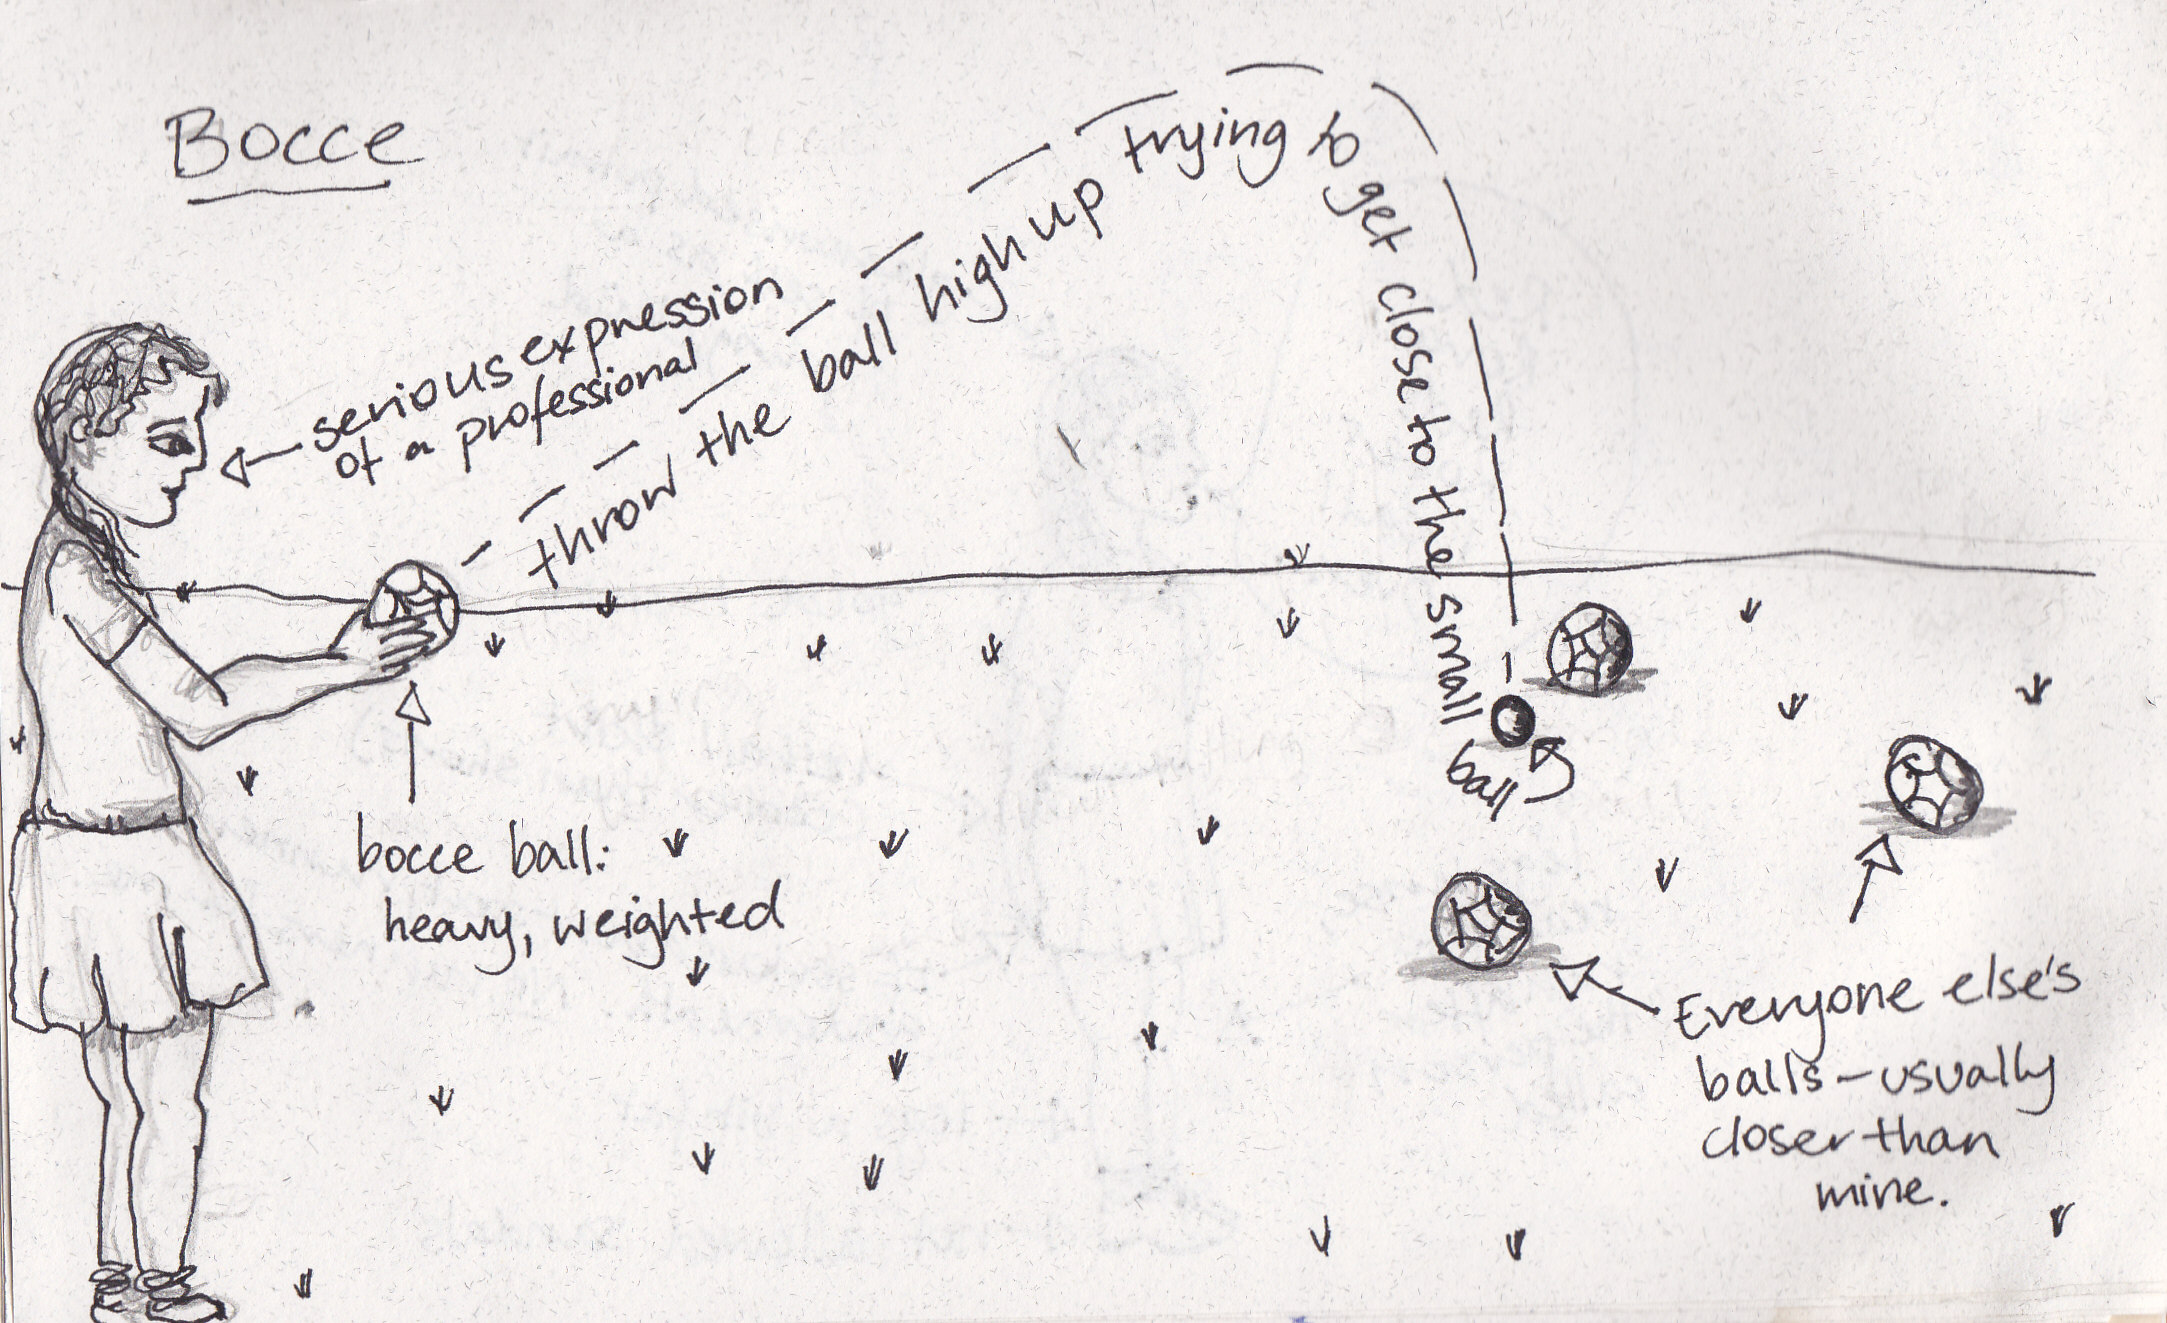 racquetball court diagram 1973 dodge dart sport wiring pickleball free engine image